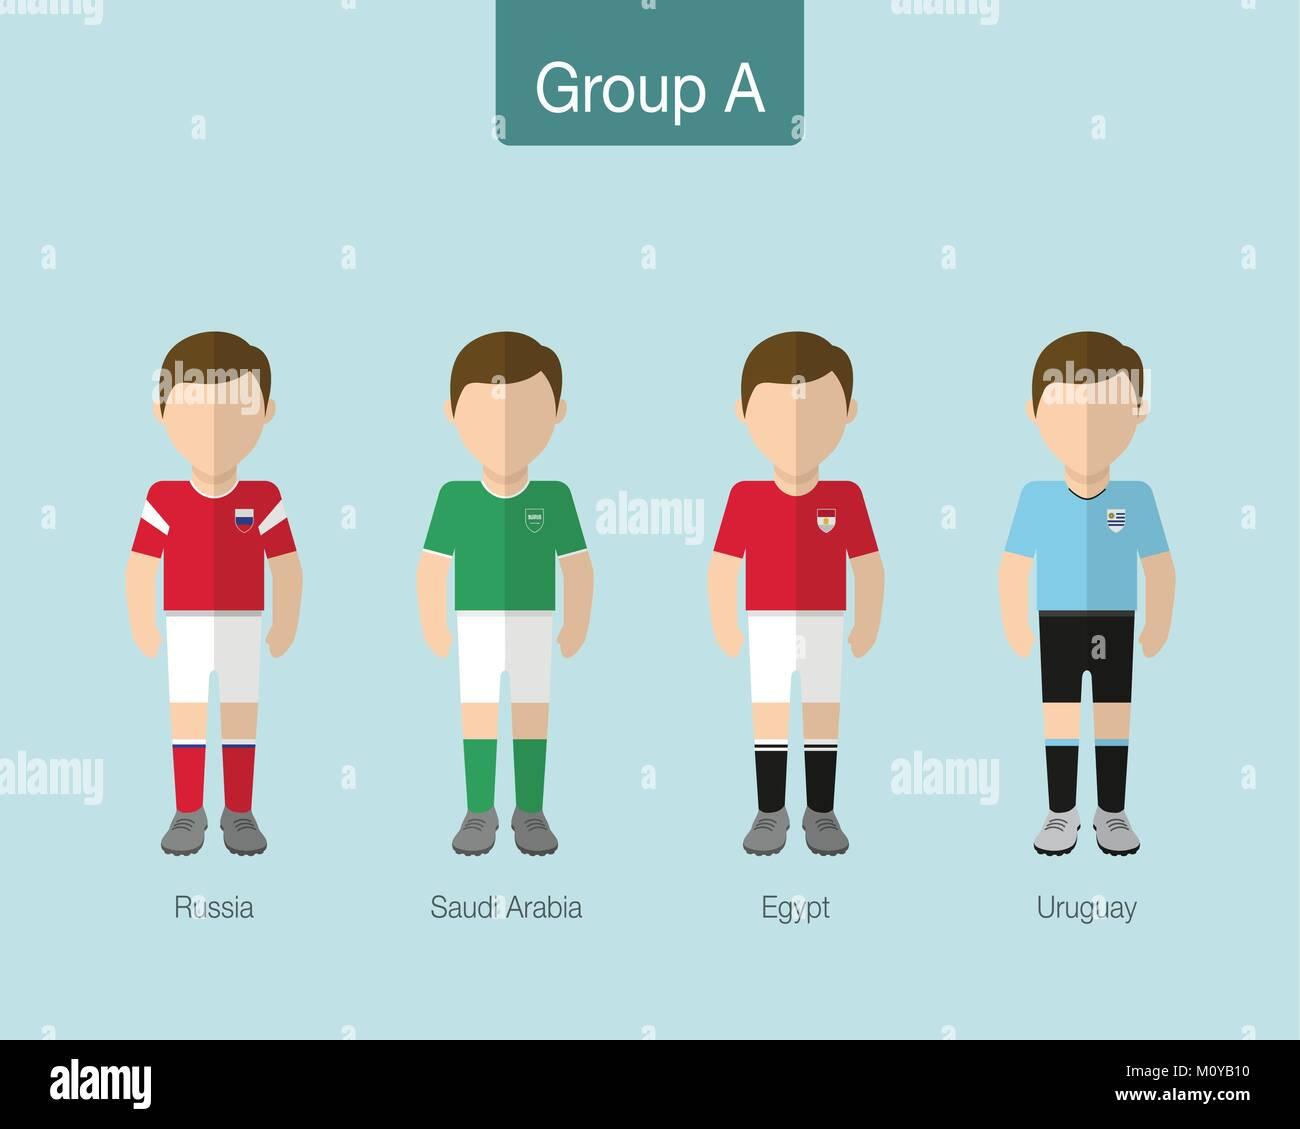 ddc601146ce 2018 Soccer or football team uniform. Group A with RUSSIA, SAUDI ARABIA,  EGYPT, URUGUAY. Flat design. Vector illustration.